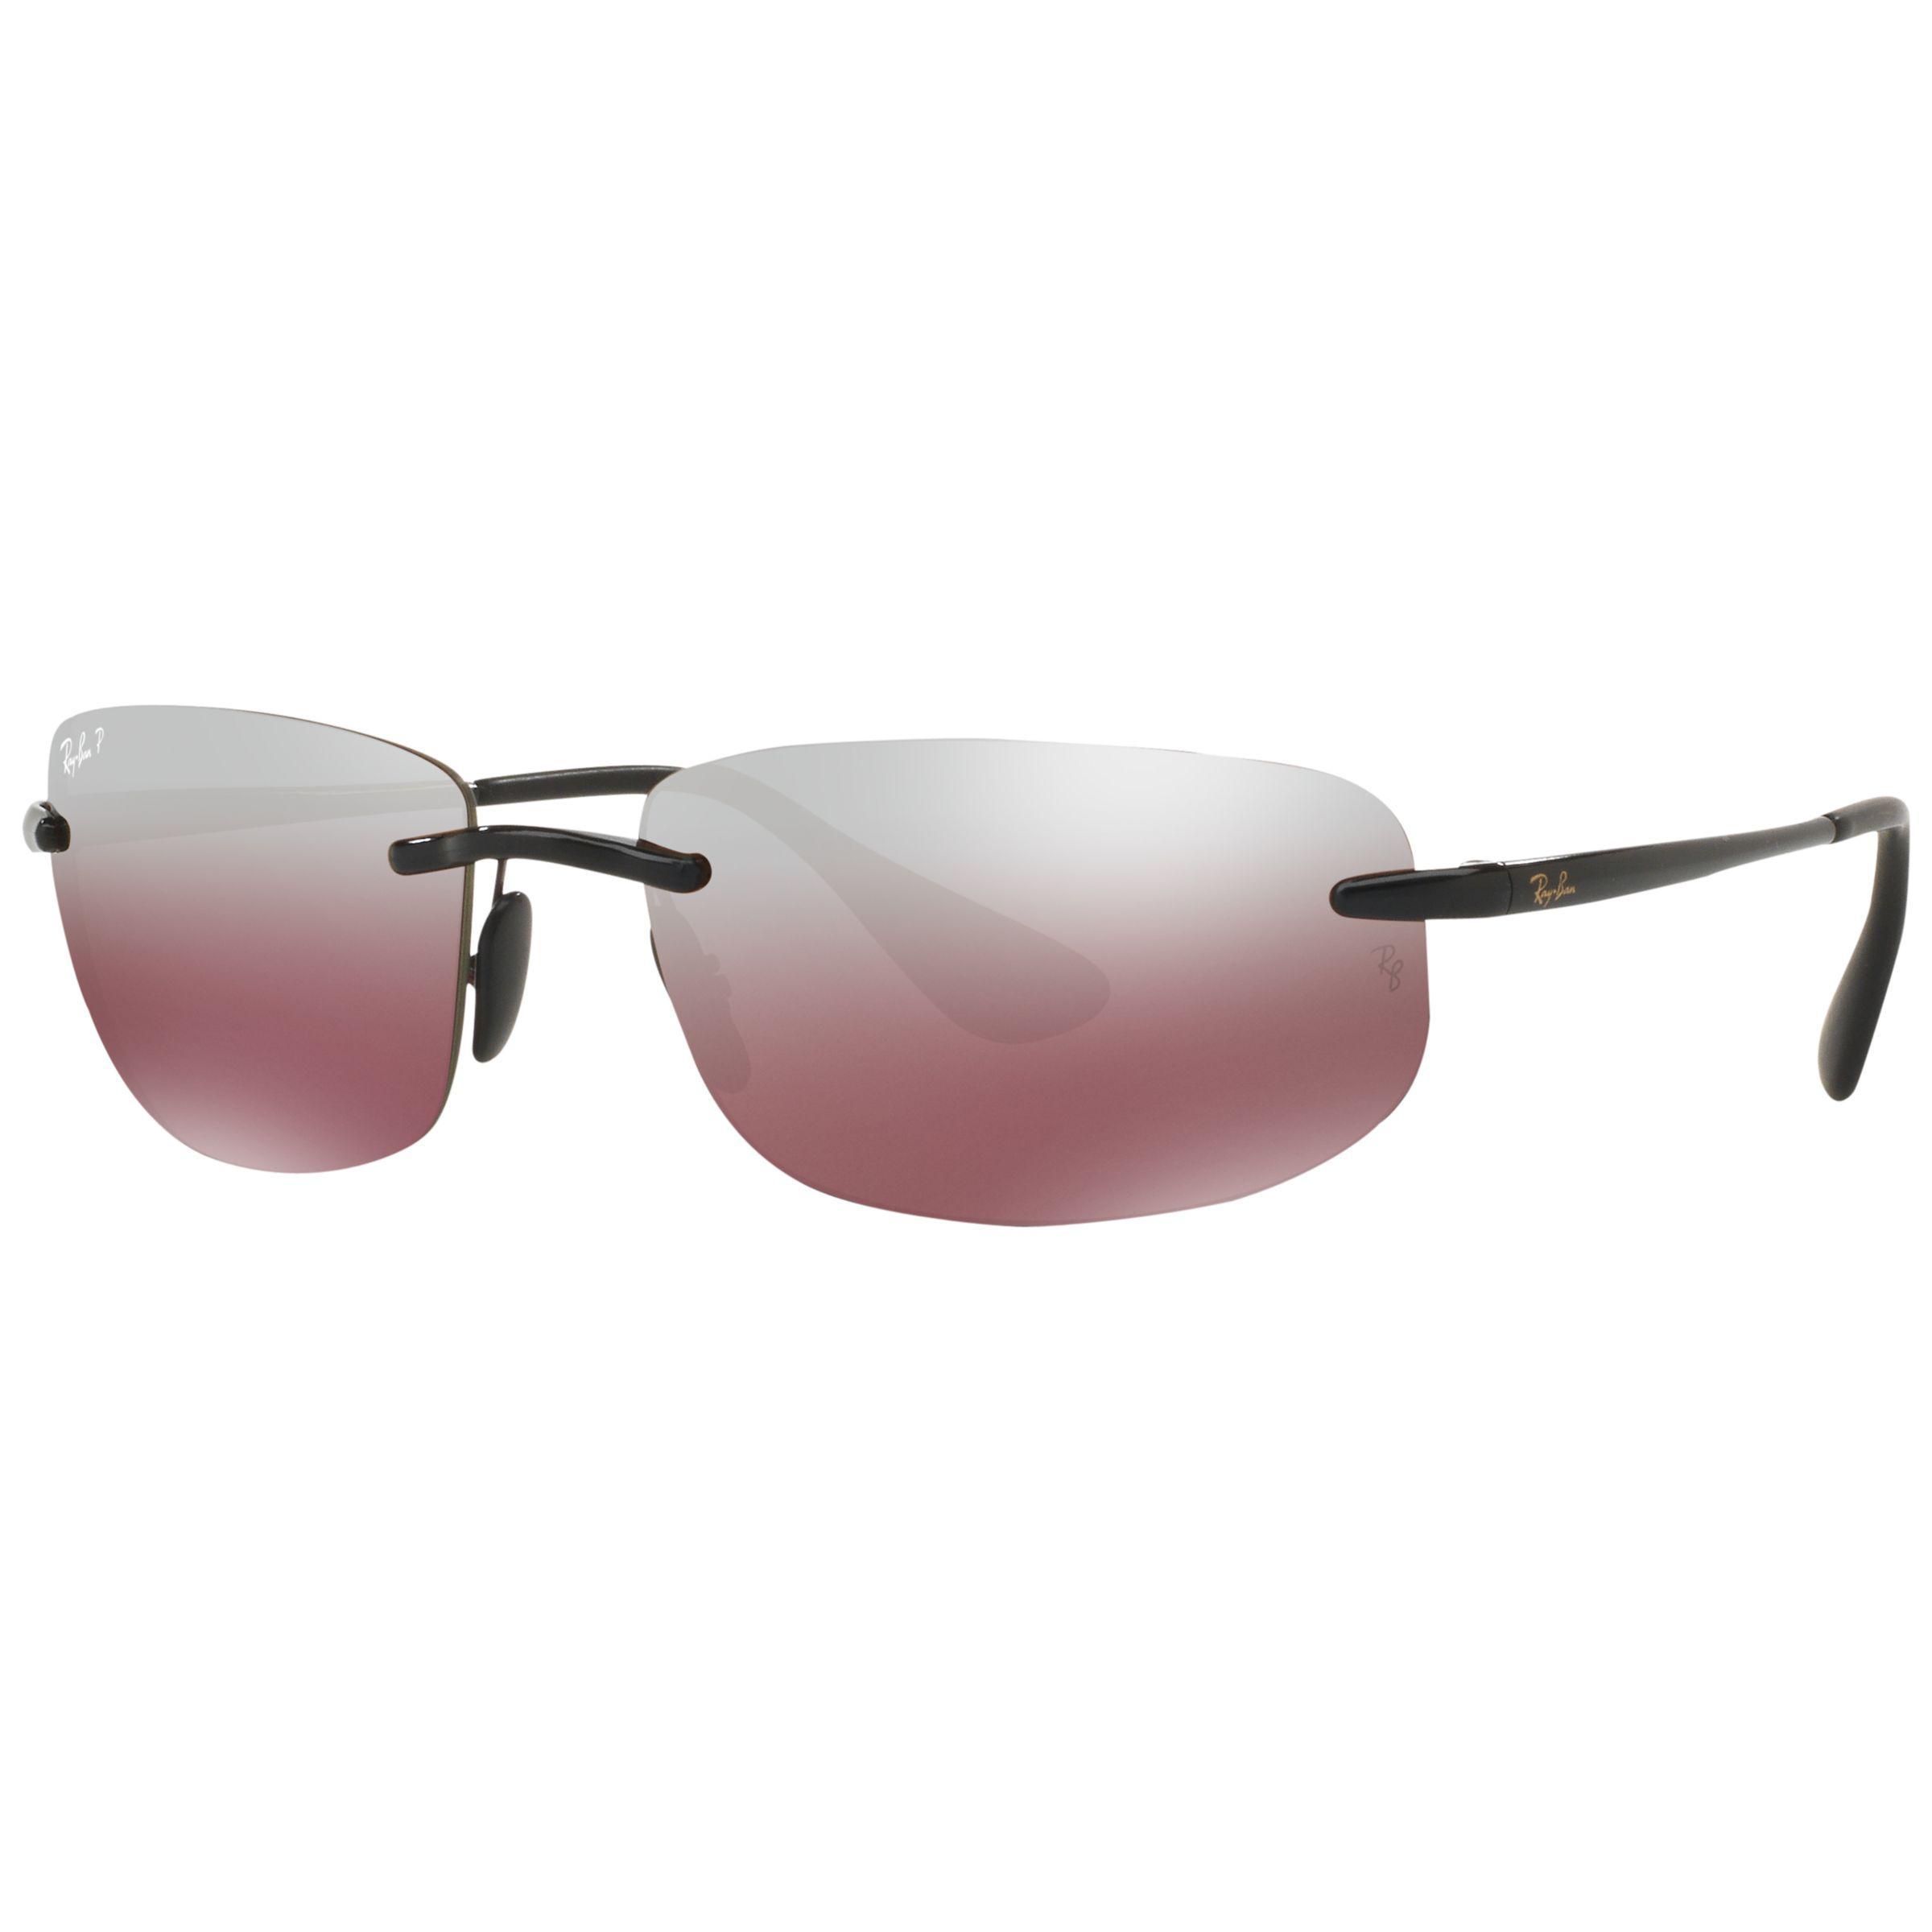 22208daff9 Gallery. Men s Oakley Batwolf Men s Ray Ban Clubmaster Men s Half Framed  Sunglasses Men s Black ...